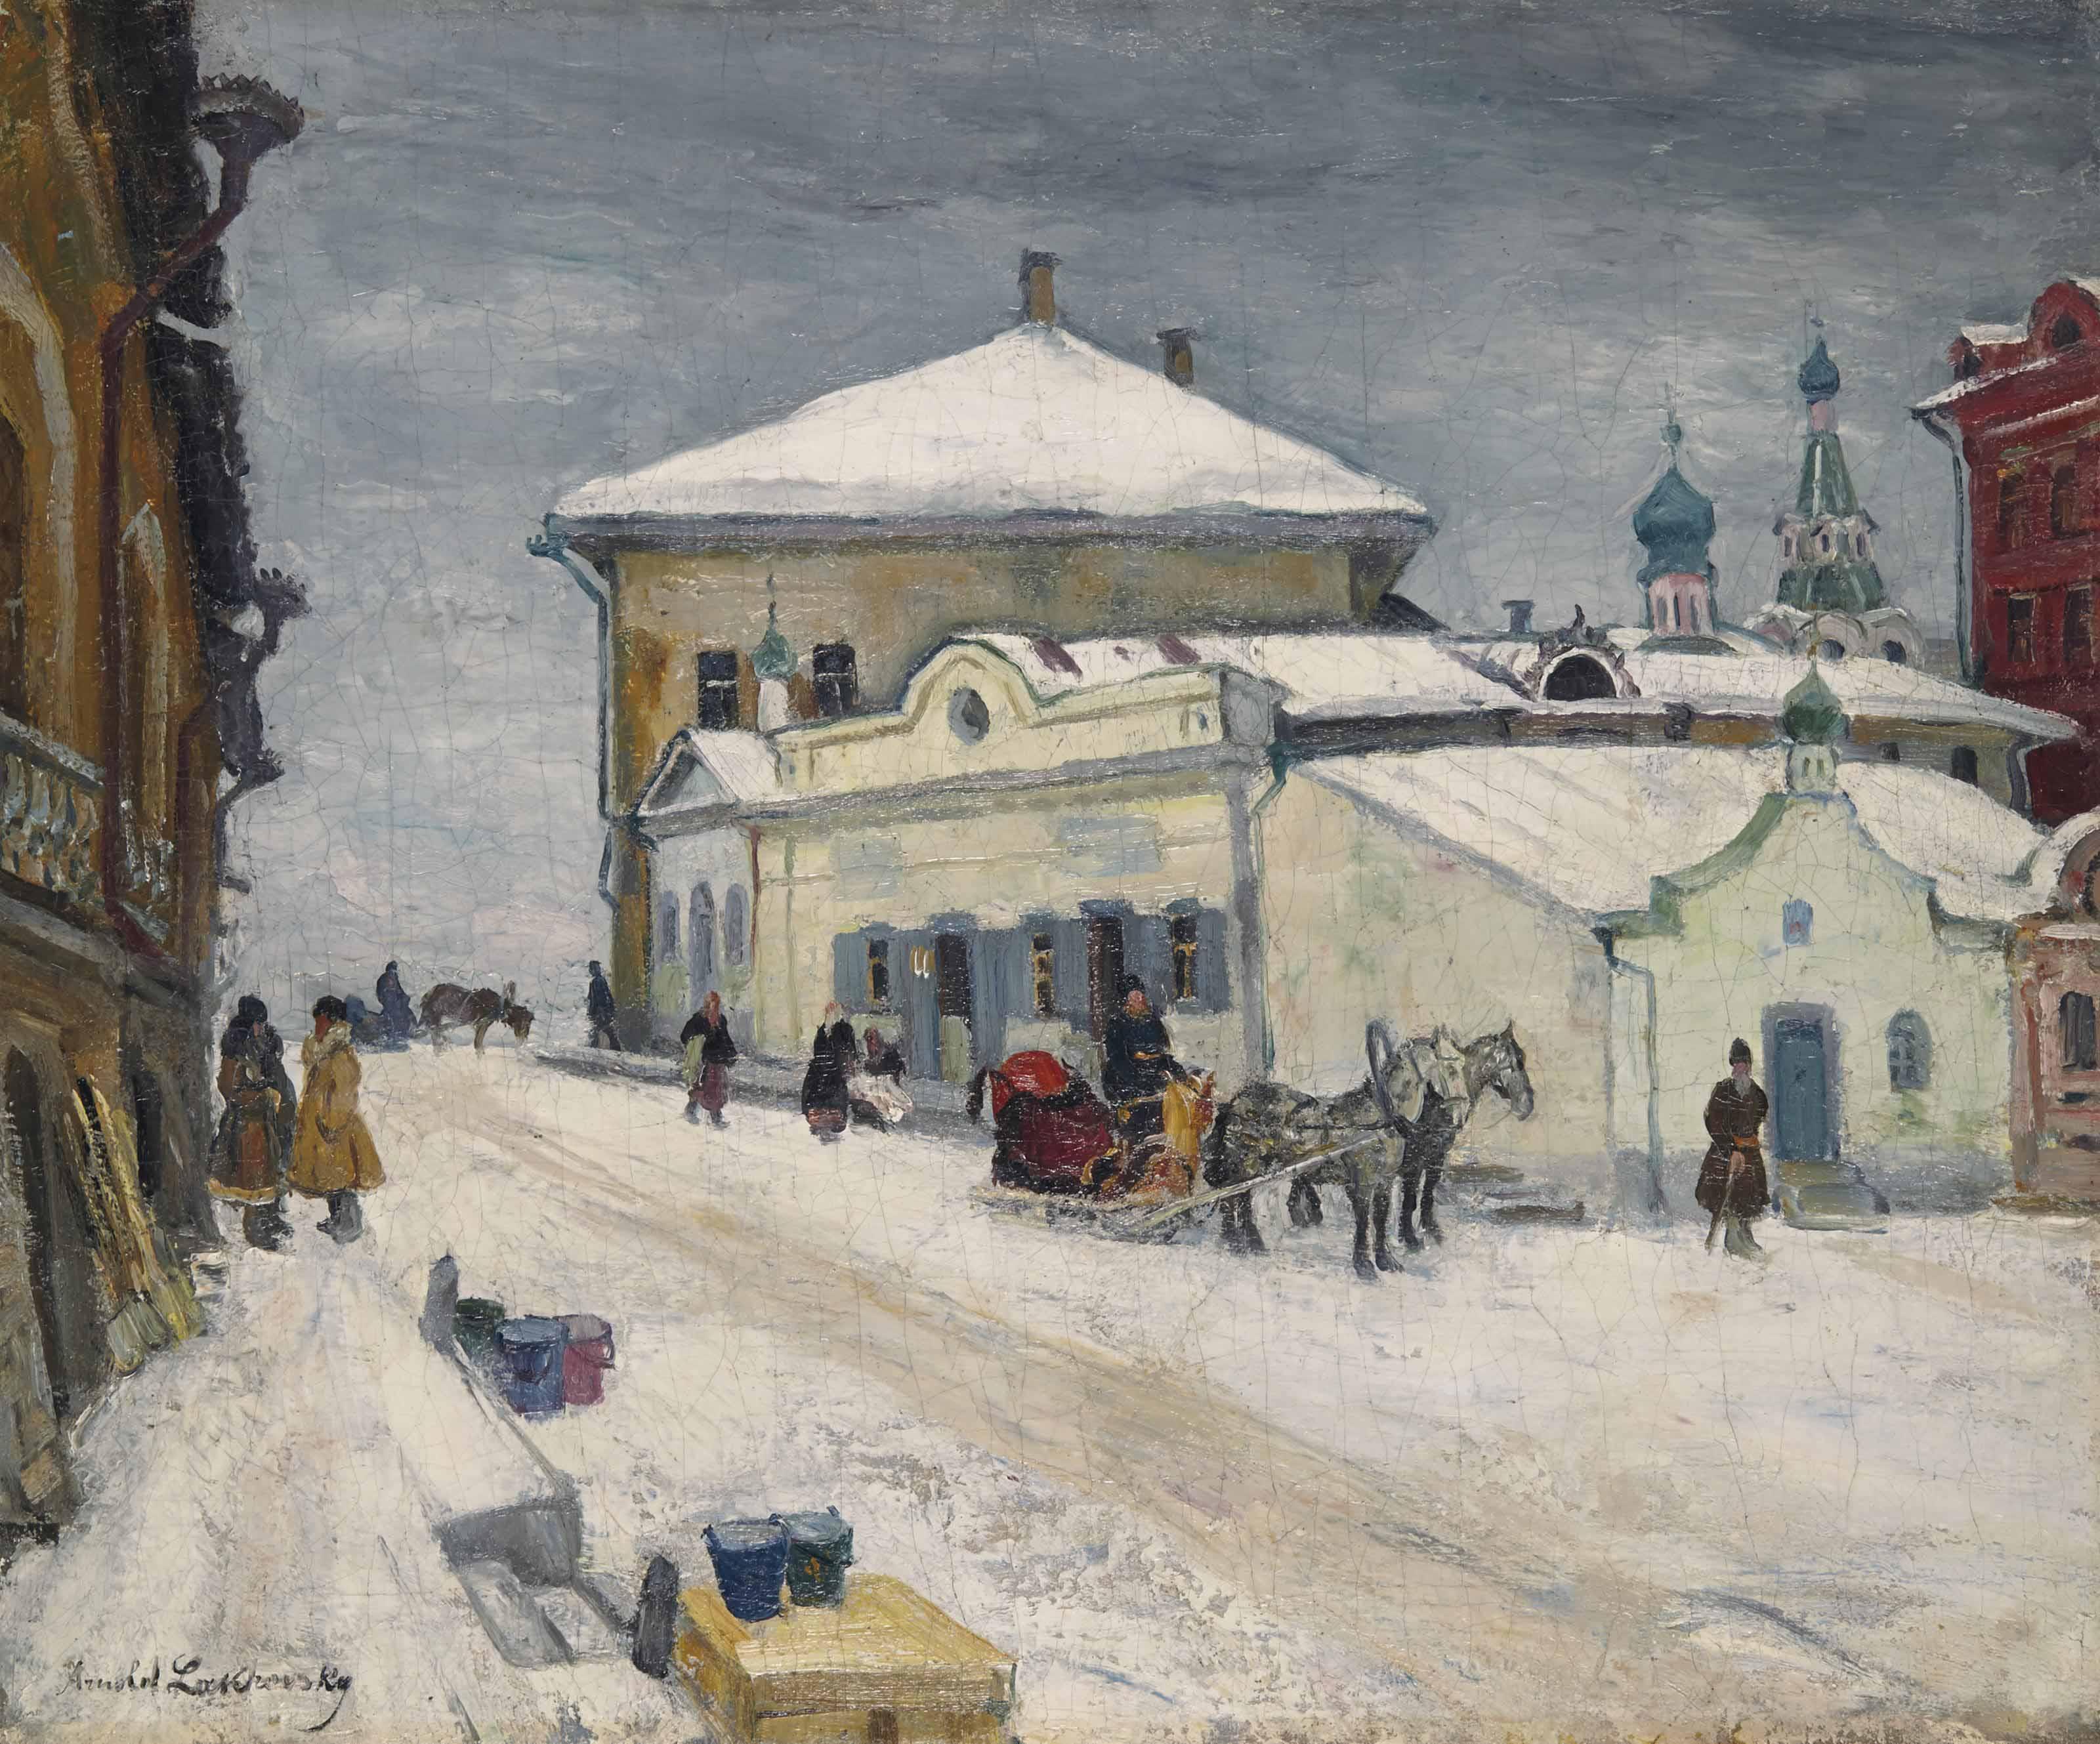 A snowy village